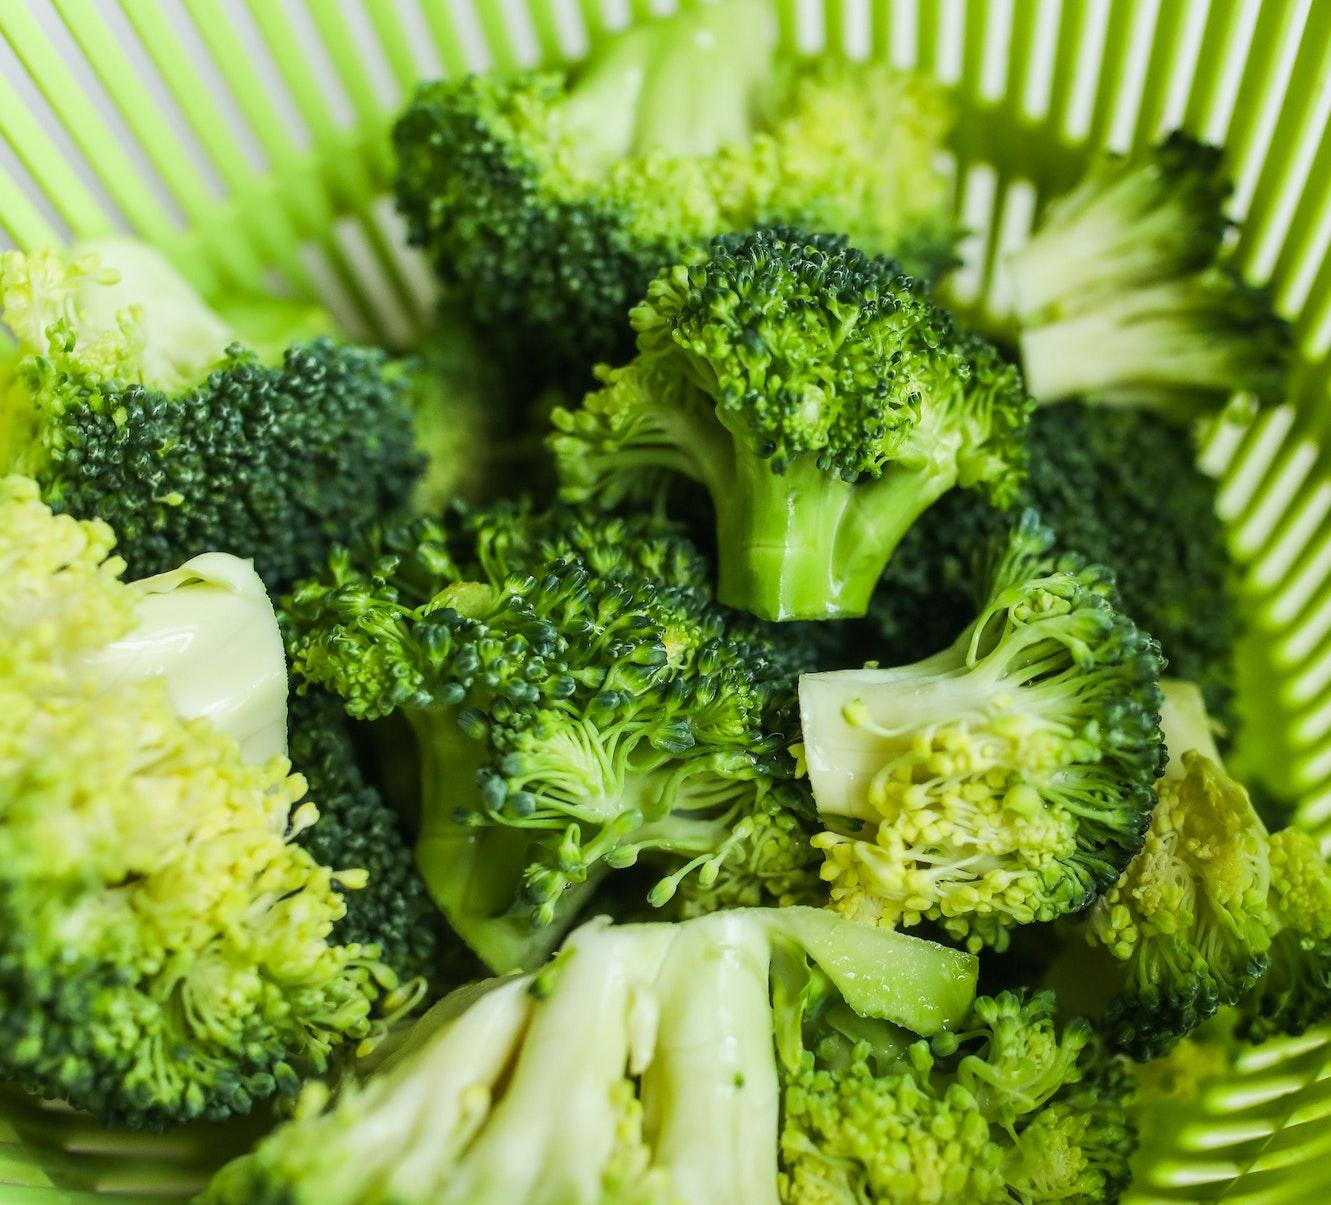 broccoli in a salad strainer basket